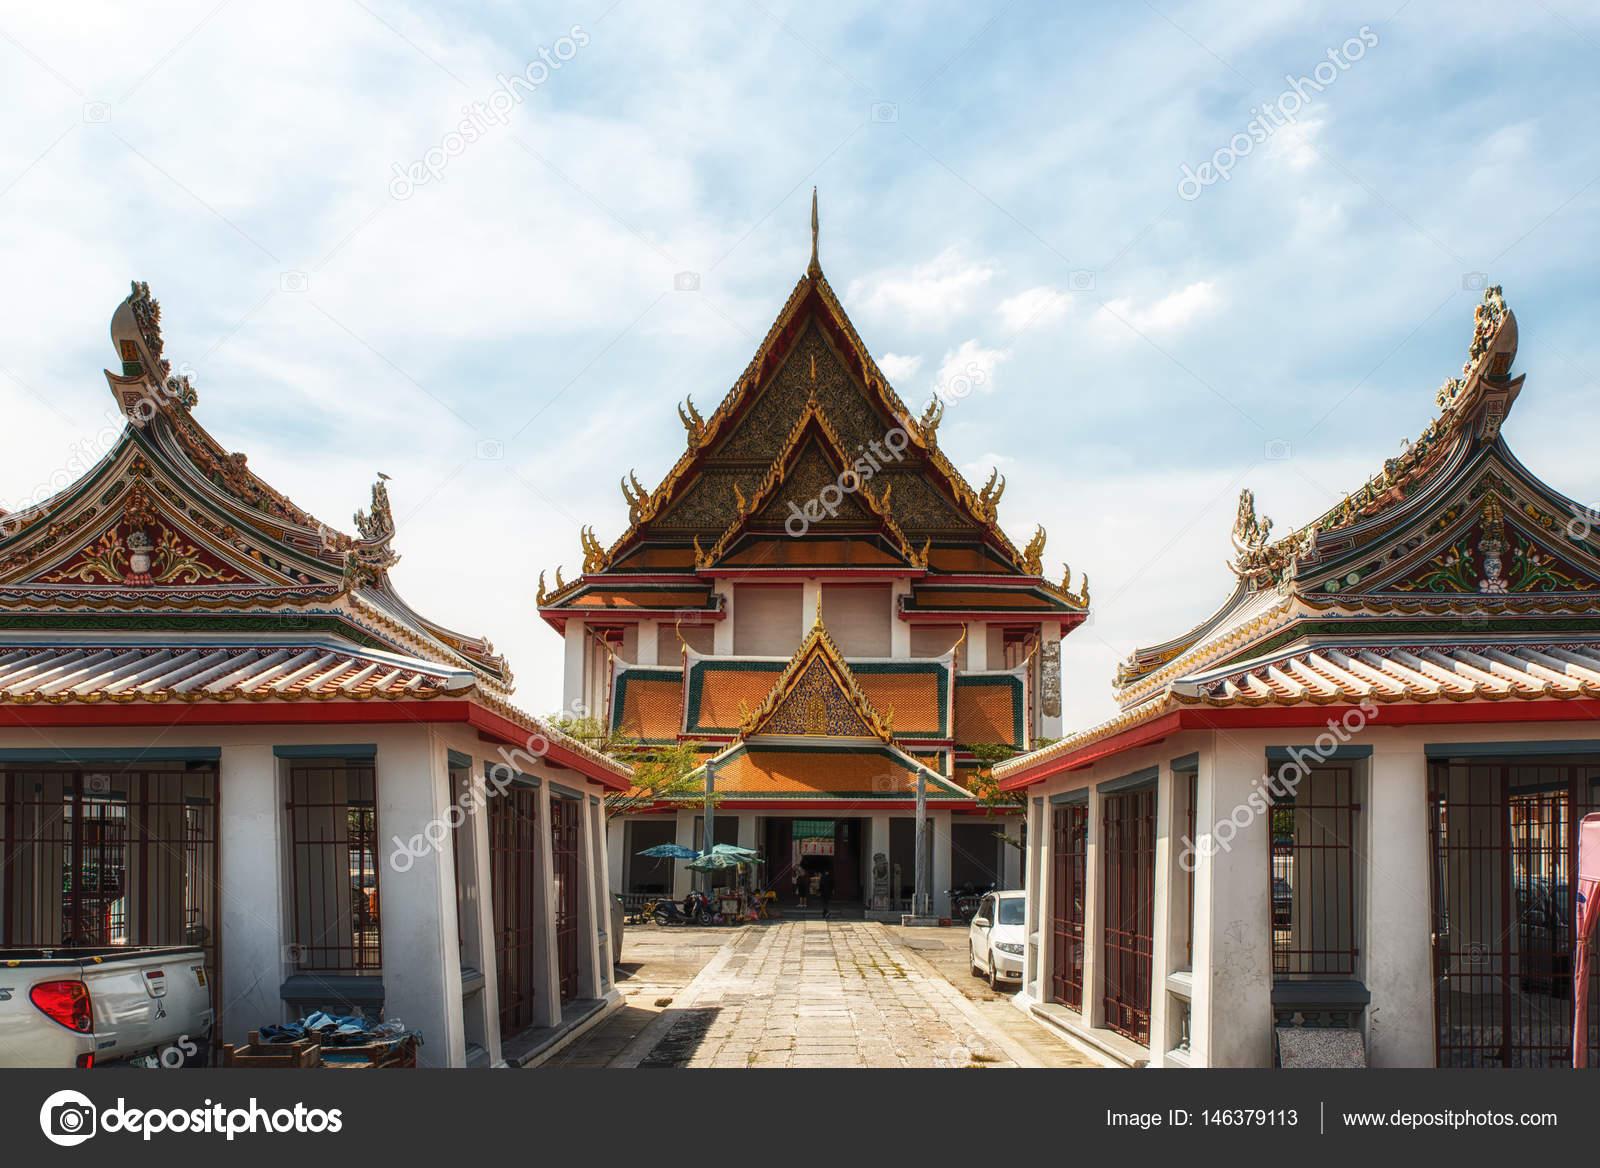 famous ancient architecture. Royal Buddha Temple In Bangkok, Thailand - Wat Kalayanamit Woramahawiharn. Famous Asian Ancient Architecture Landmark And Travel Destination \u2014 Photo By